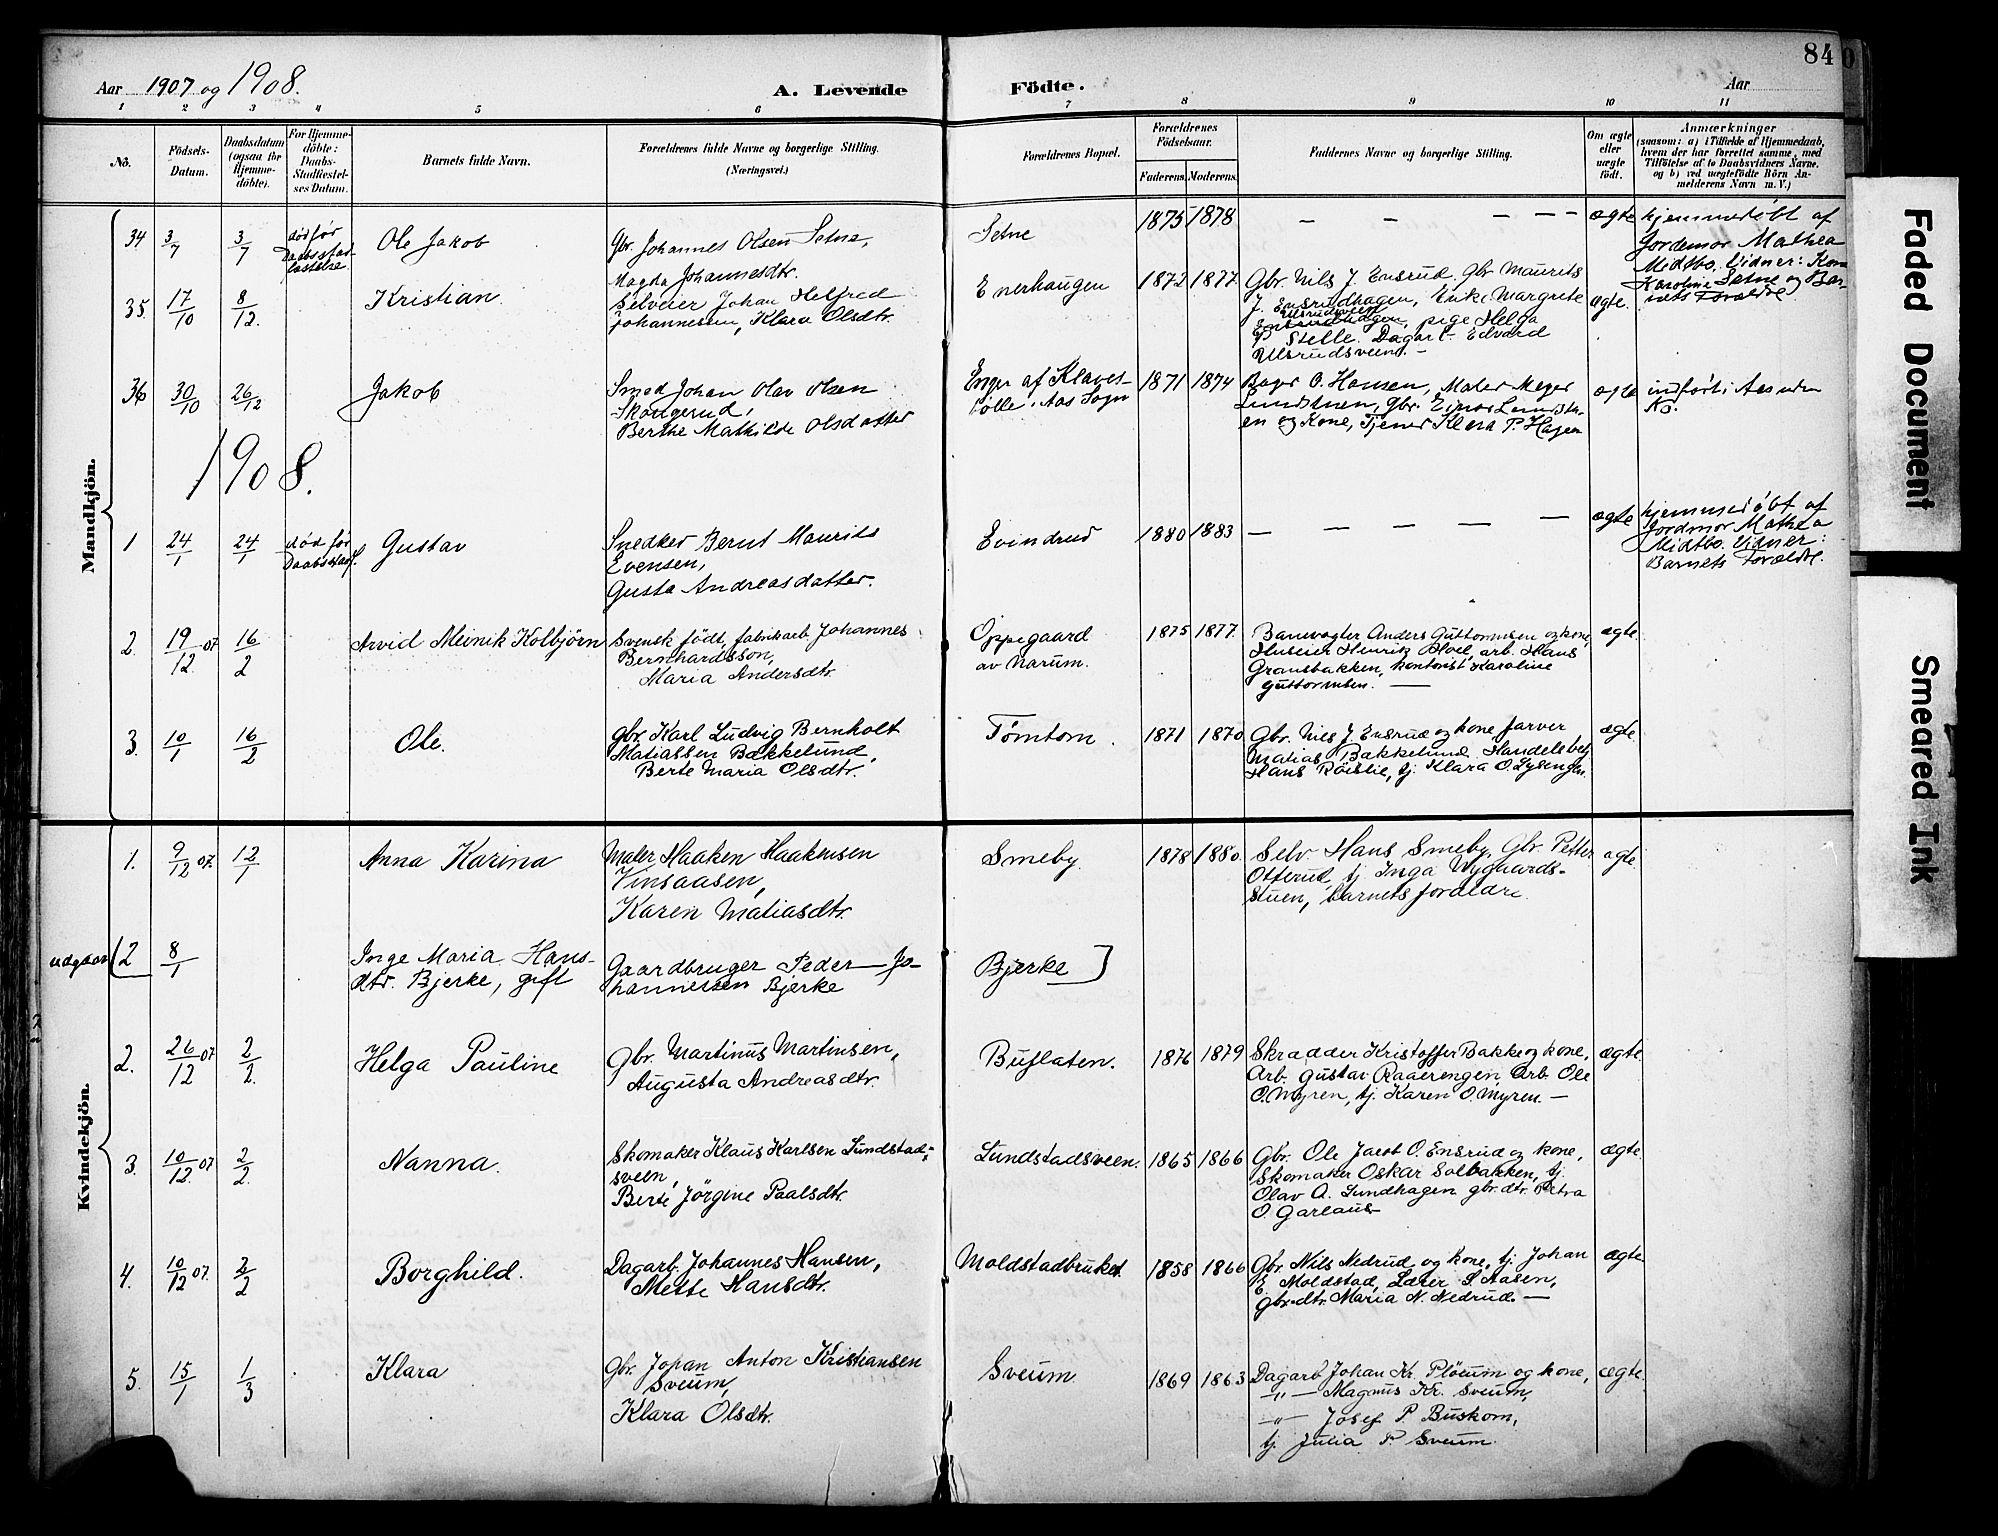 SAH, Vestre Toten prestekontor, H/Ha/Haa/L0013: Ministerialbok nr. 13, 1895-1911, s. 84